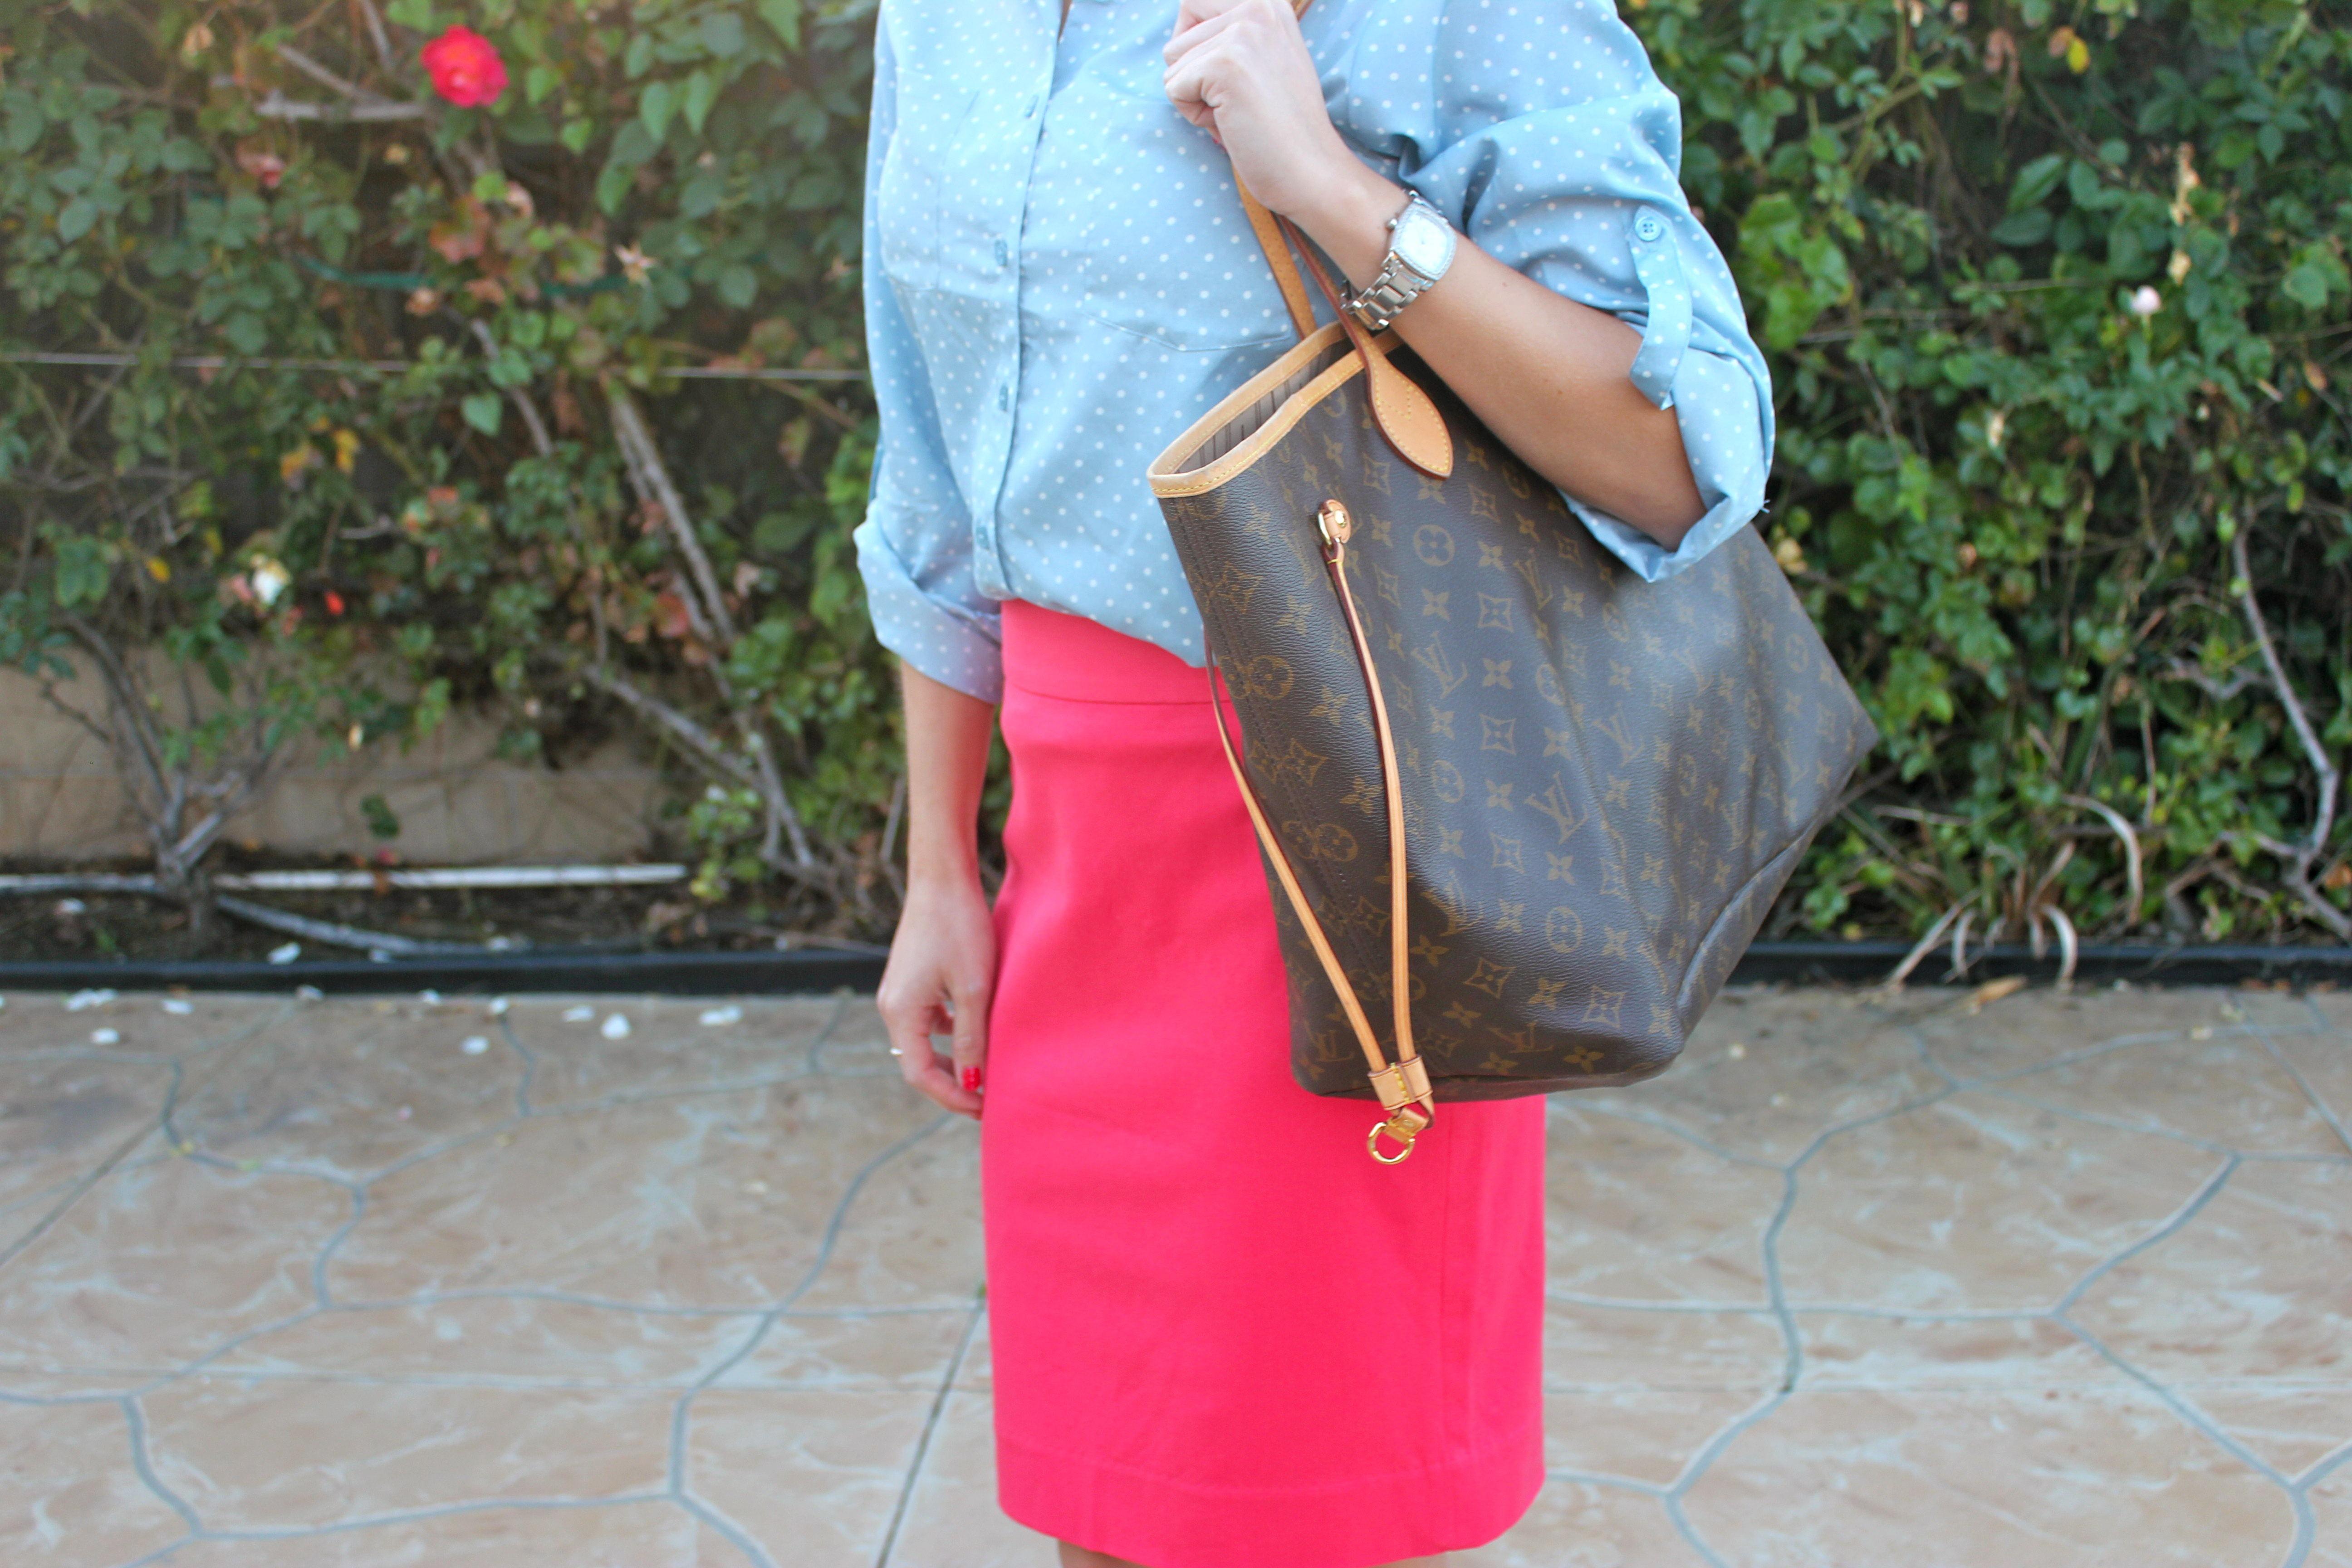 8d8a08ec7b4  Top  Target  Skirt  Banana Republic  Handbag  Louis Vuitton  Shoes  Franco  Sarto (found at DSW!)